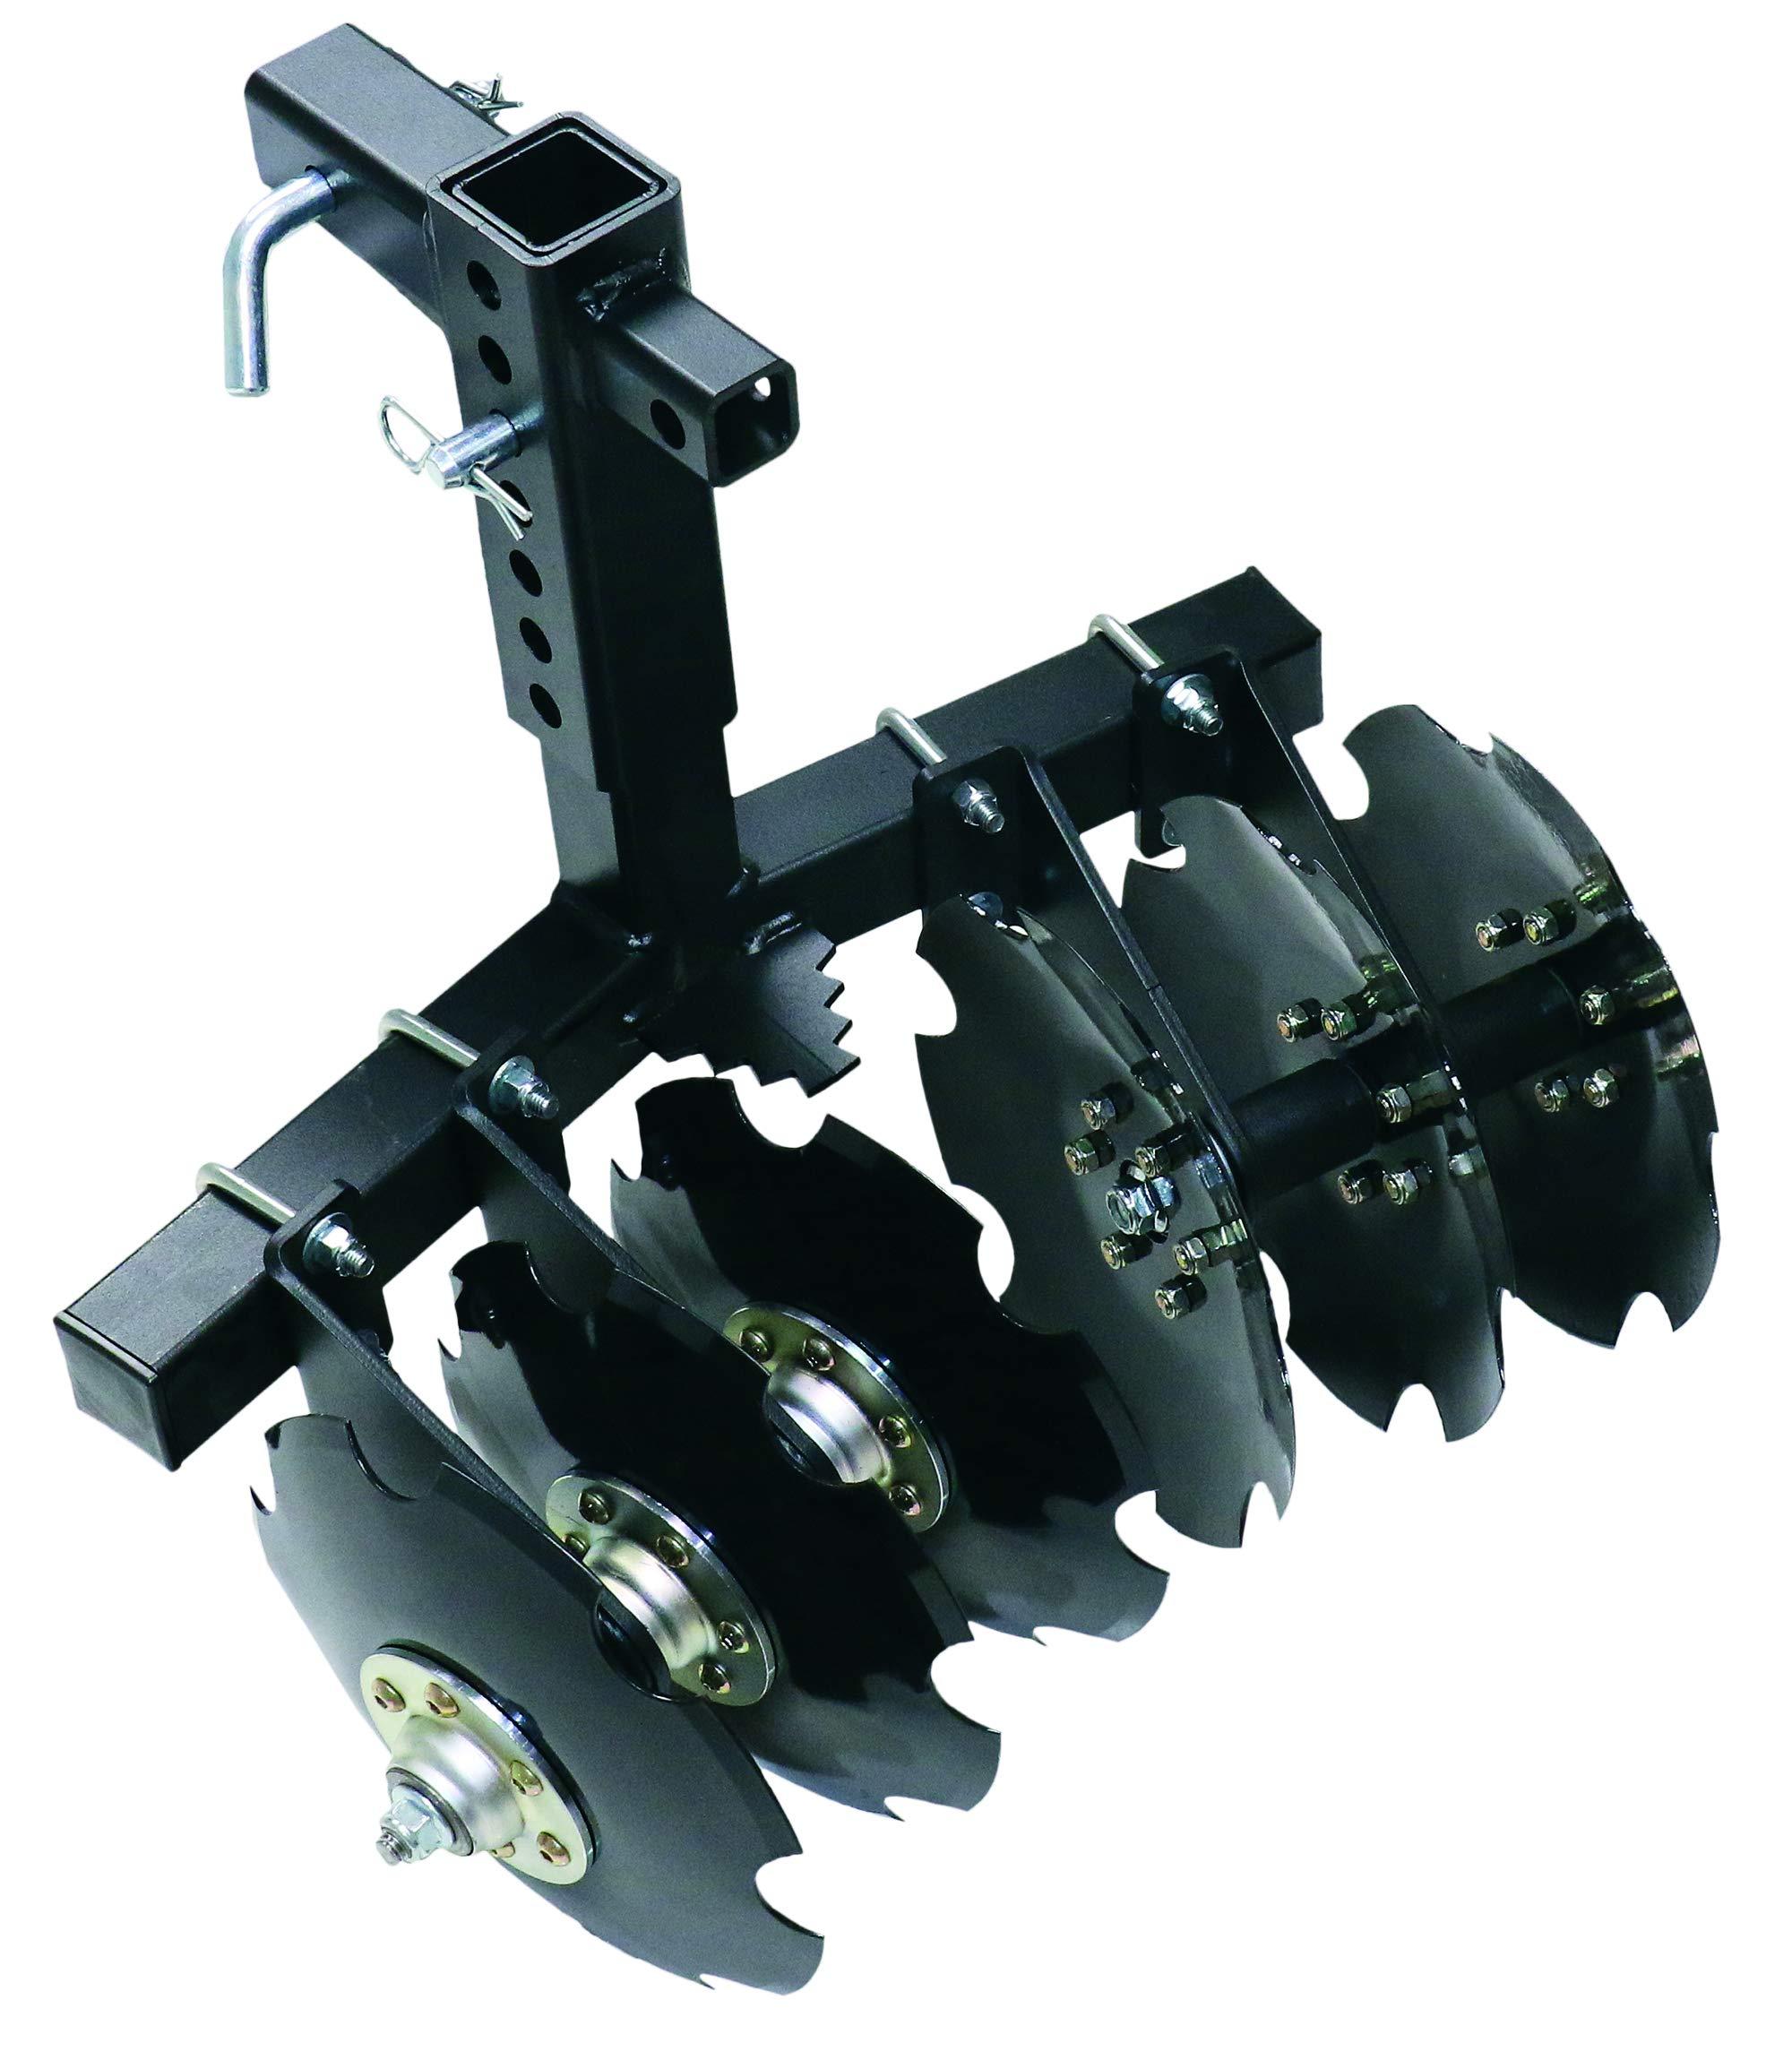 Battle Armor Designs 6-Disk Big Buck ATV/UTV 2'' Receiver Plow by Battle Armor (Image #1)